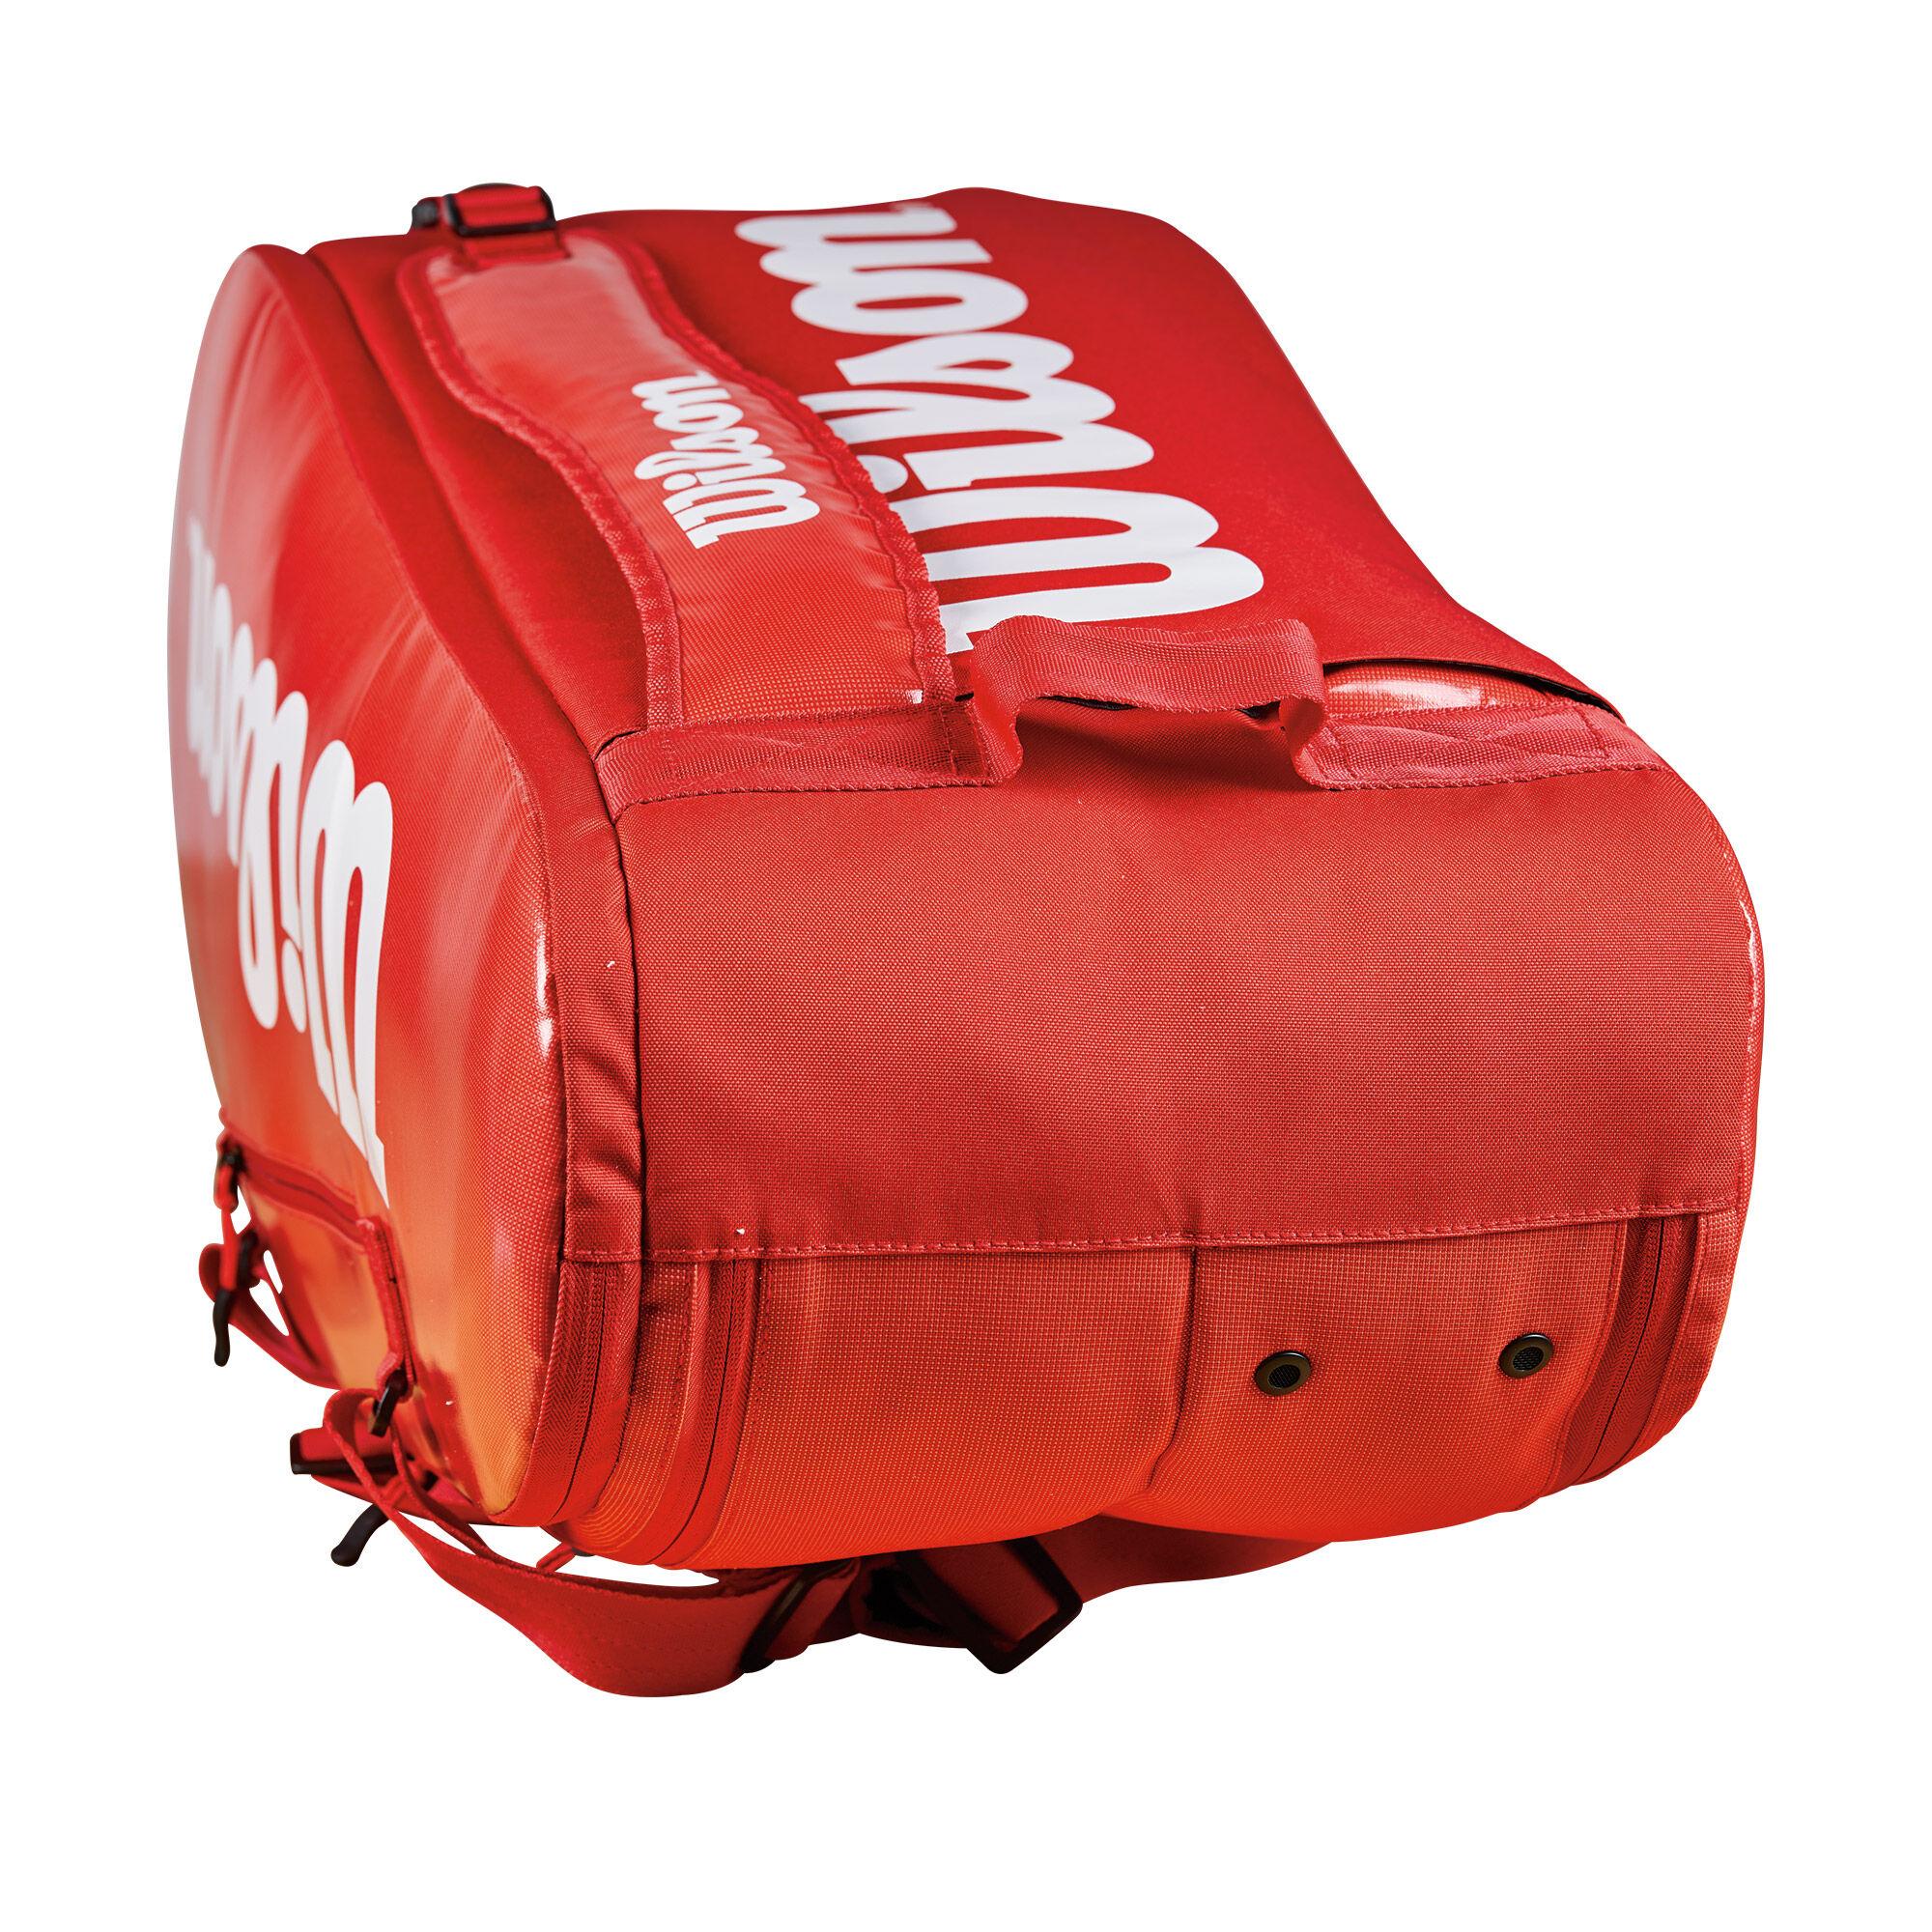 Wilson Super Tour 2 Comp Racketväska Liten Röd, Vit köp